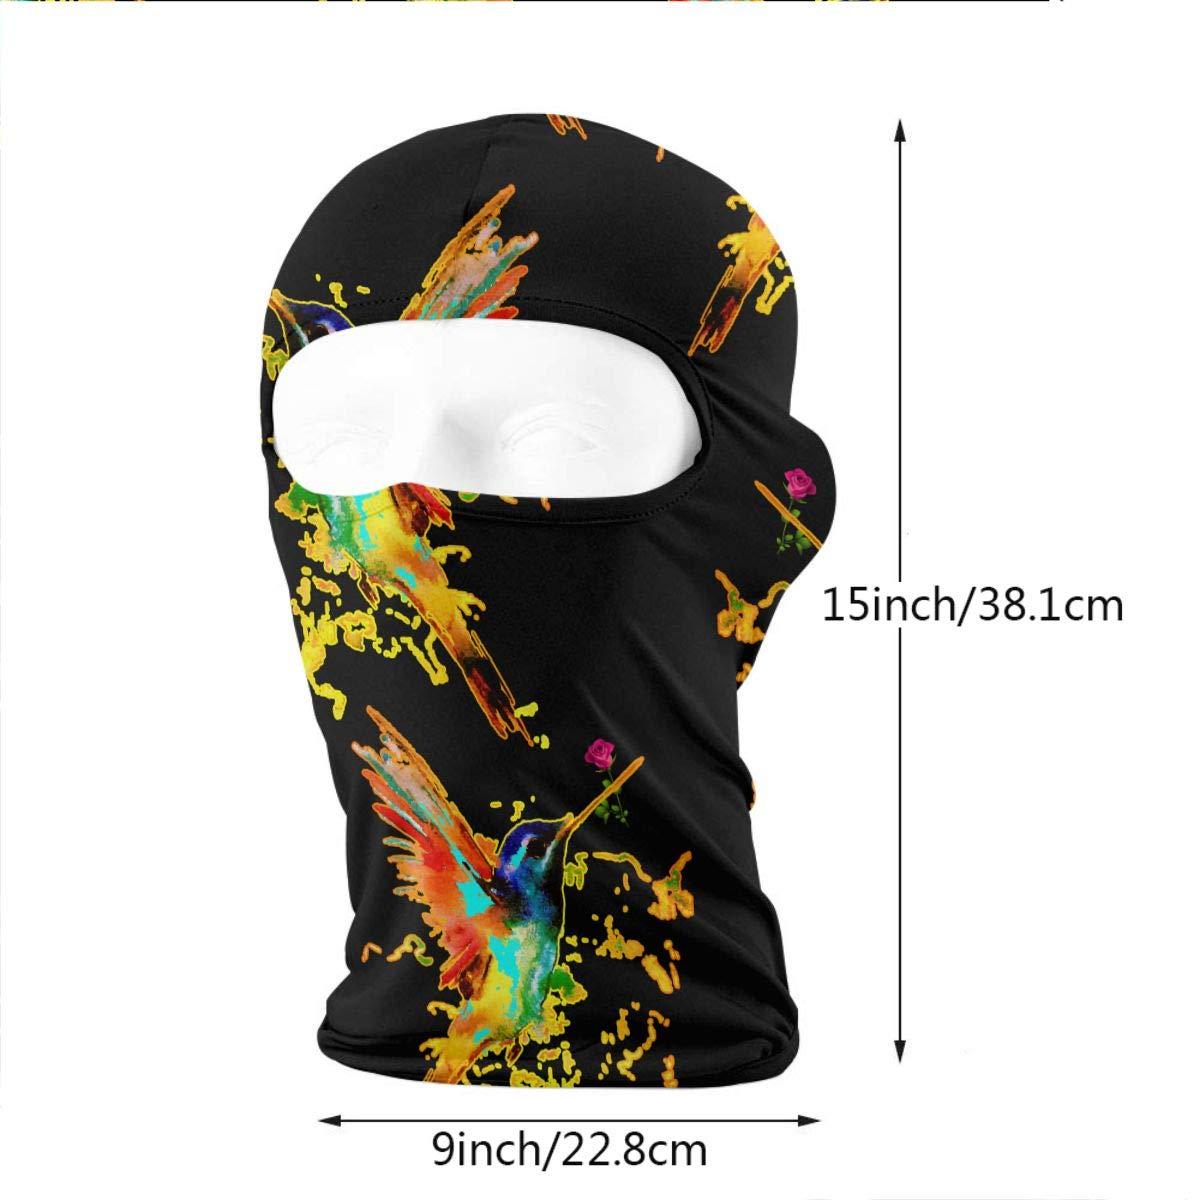 Palmerbury Flying Hummingbird Watercolor Balaclava Face Mask Hood for Neck Gaiter Headwear Helmet Liner